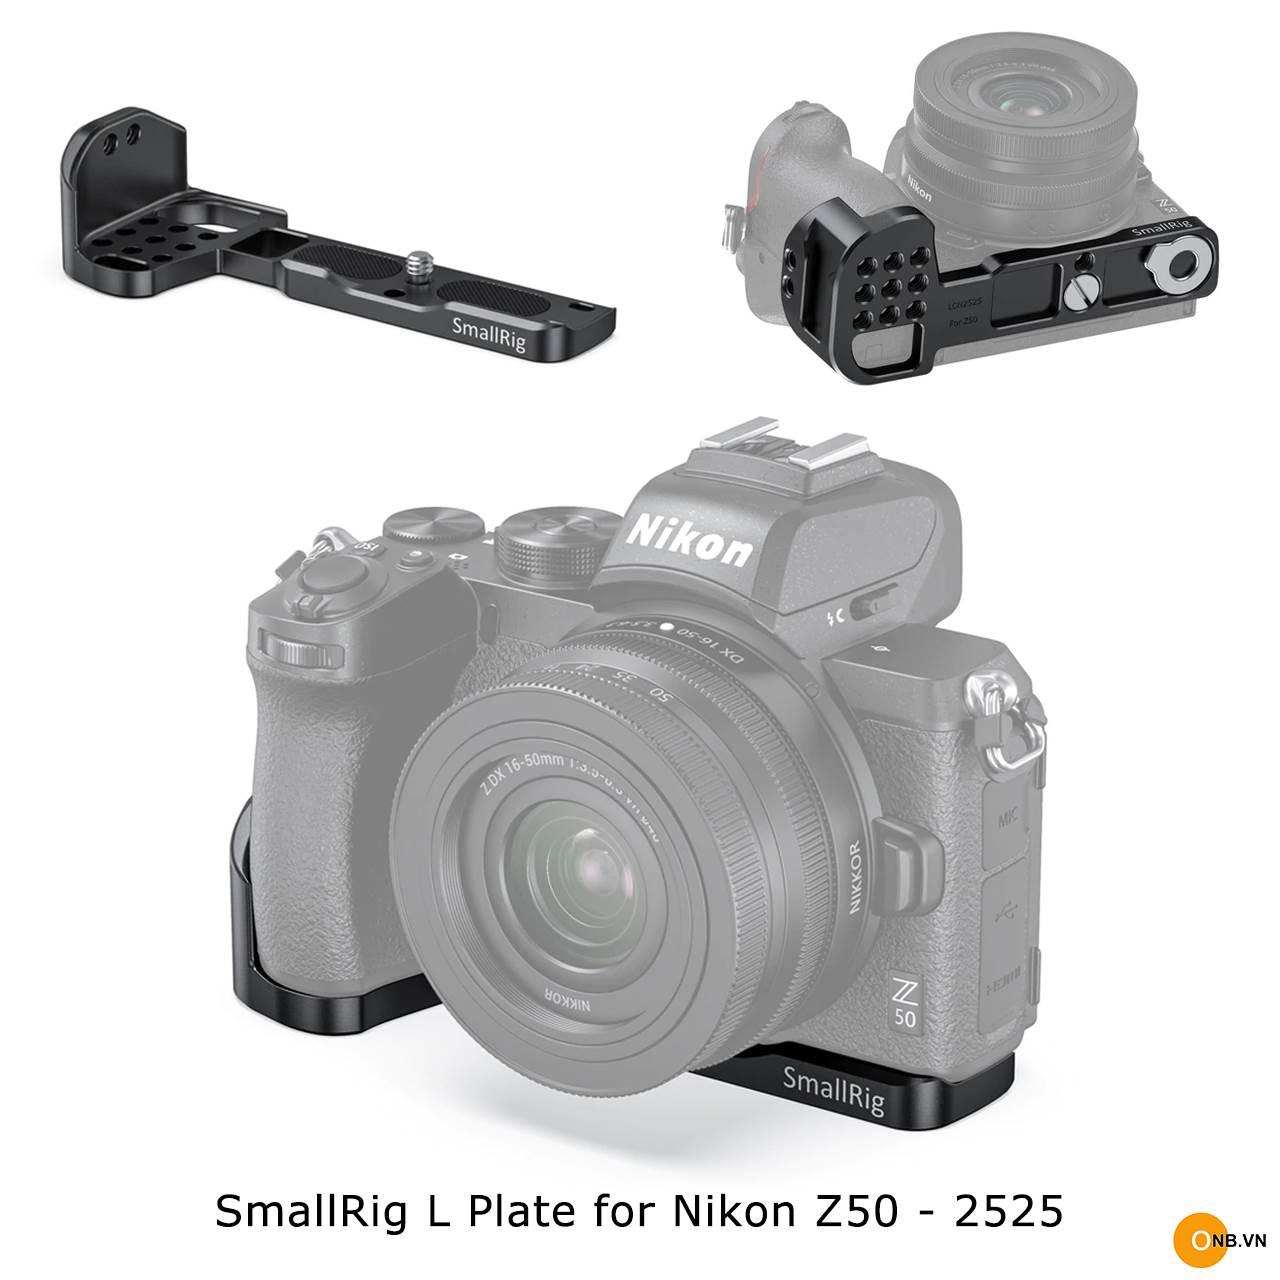 SmallRig L Plate Nikon Z50 Vlog 2525